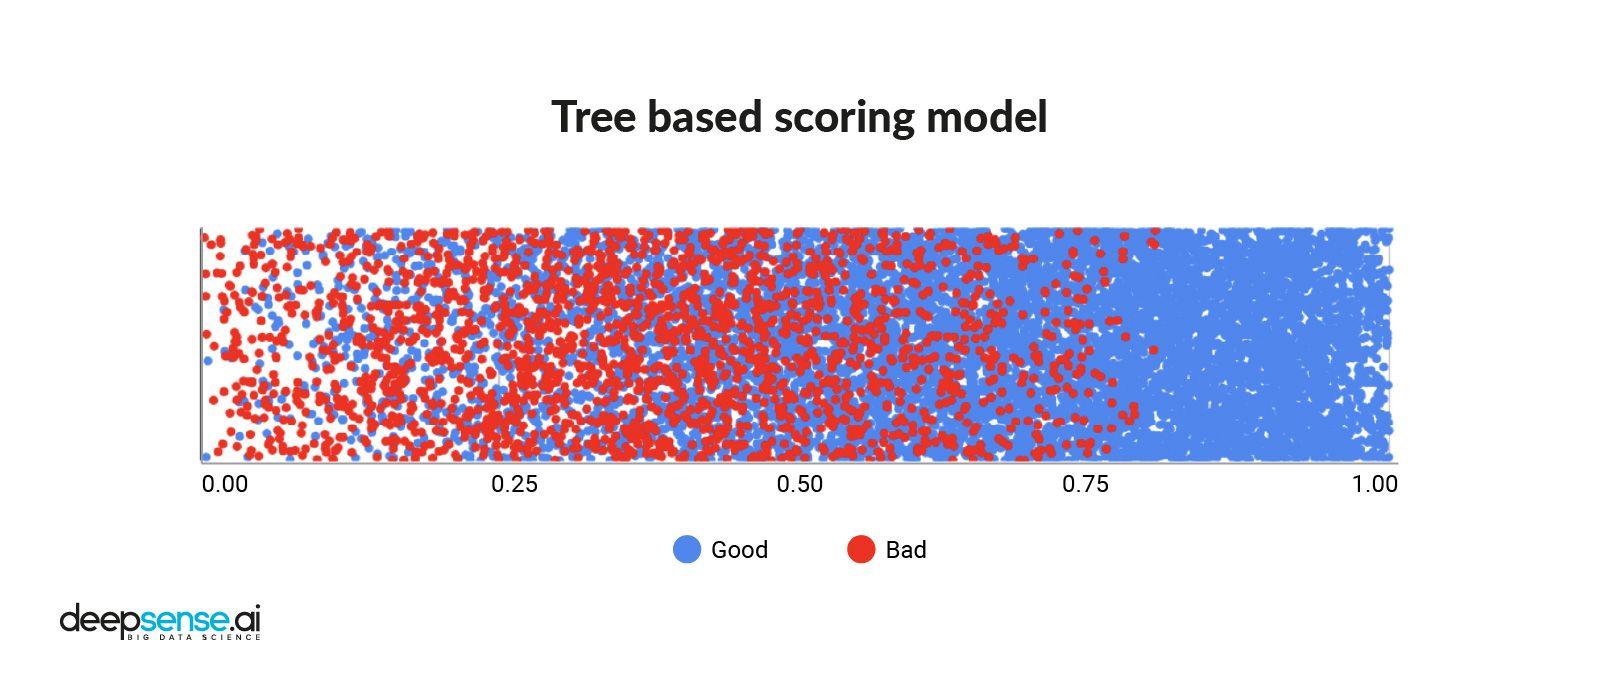 Credit scoring from tree-based model